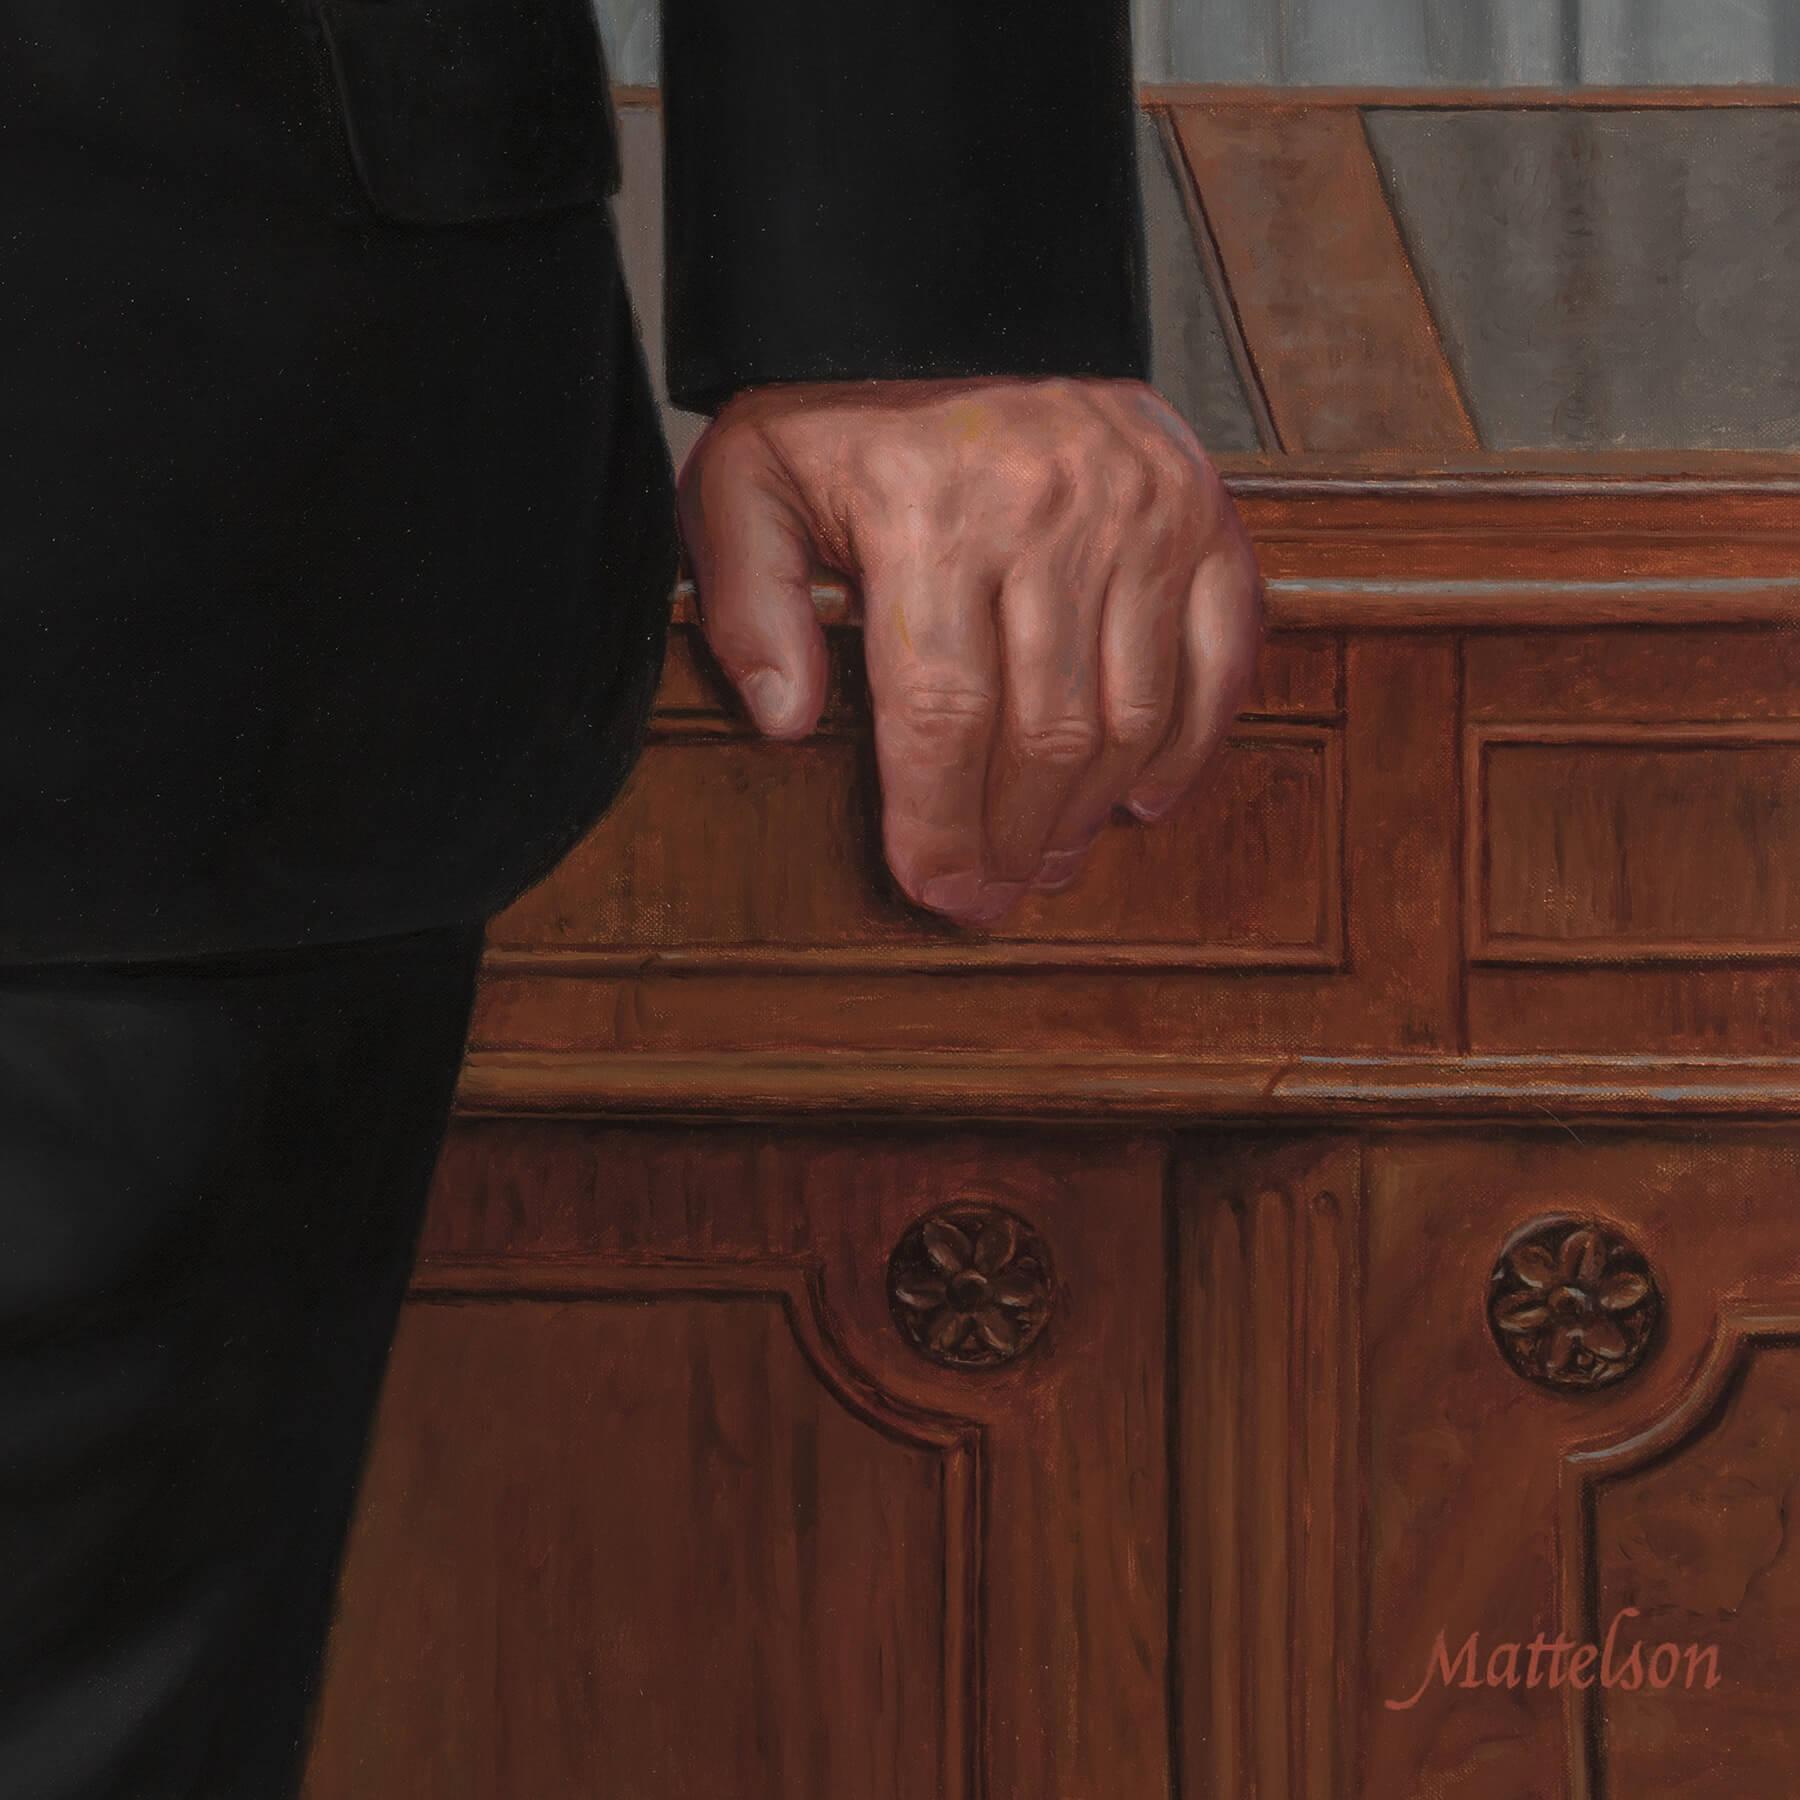 Custom oil businessman's portrait- Antique desk with wood grain and hand detail.